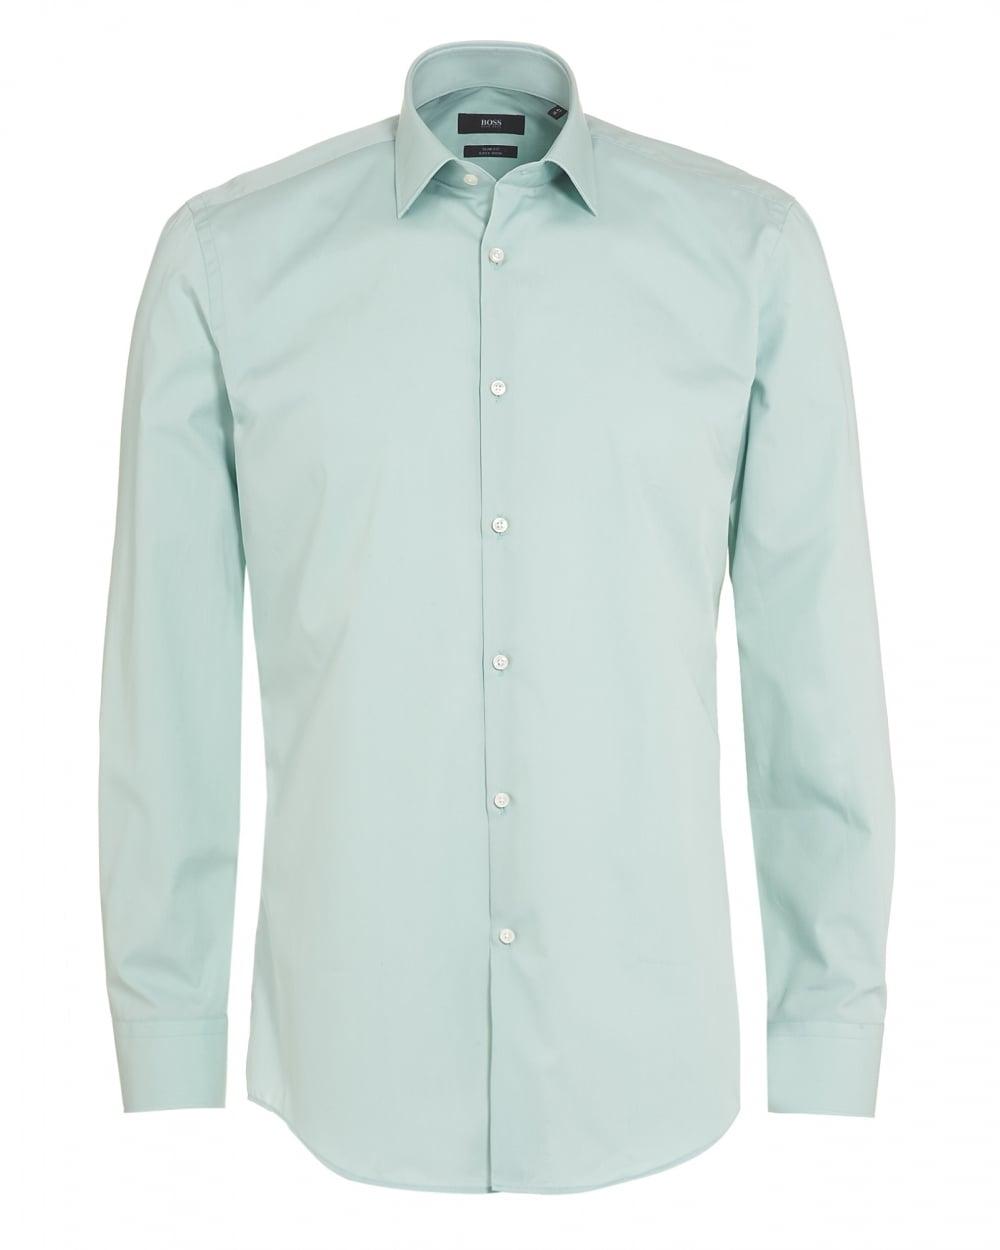 Hugo boss classic mens jenno shirt mint green slim fit for Mens slim fit formal shirts uk